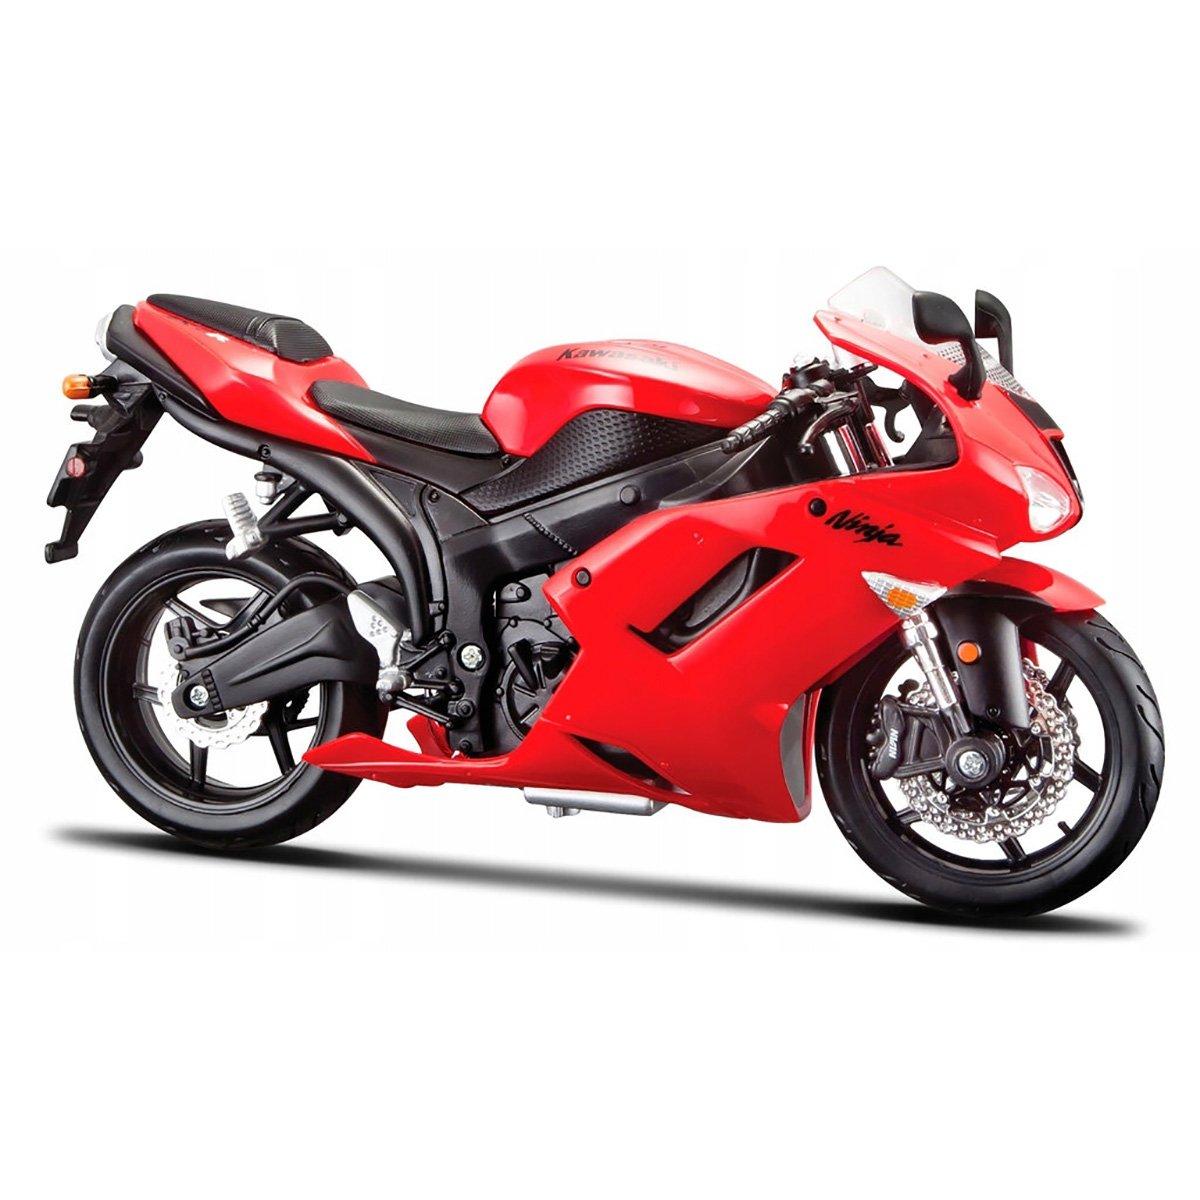 Motocicleta Maisto Kawasaki Ninja ZX-6R, 1:12